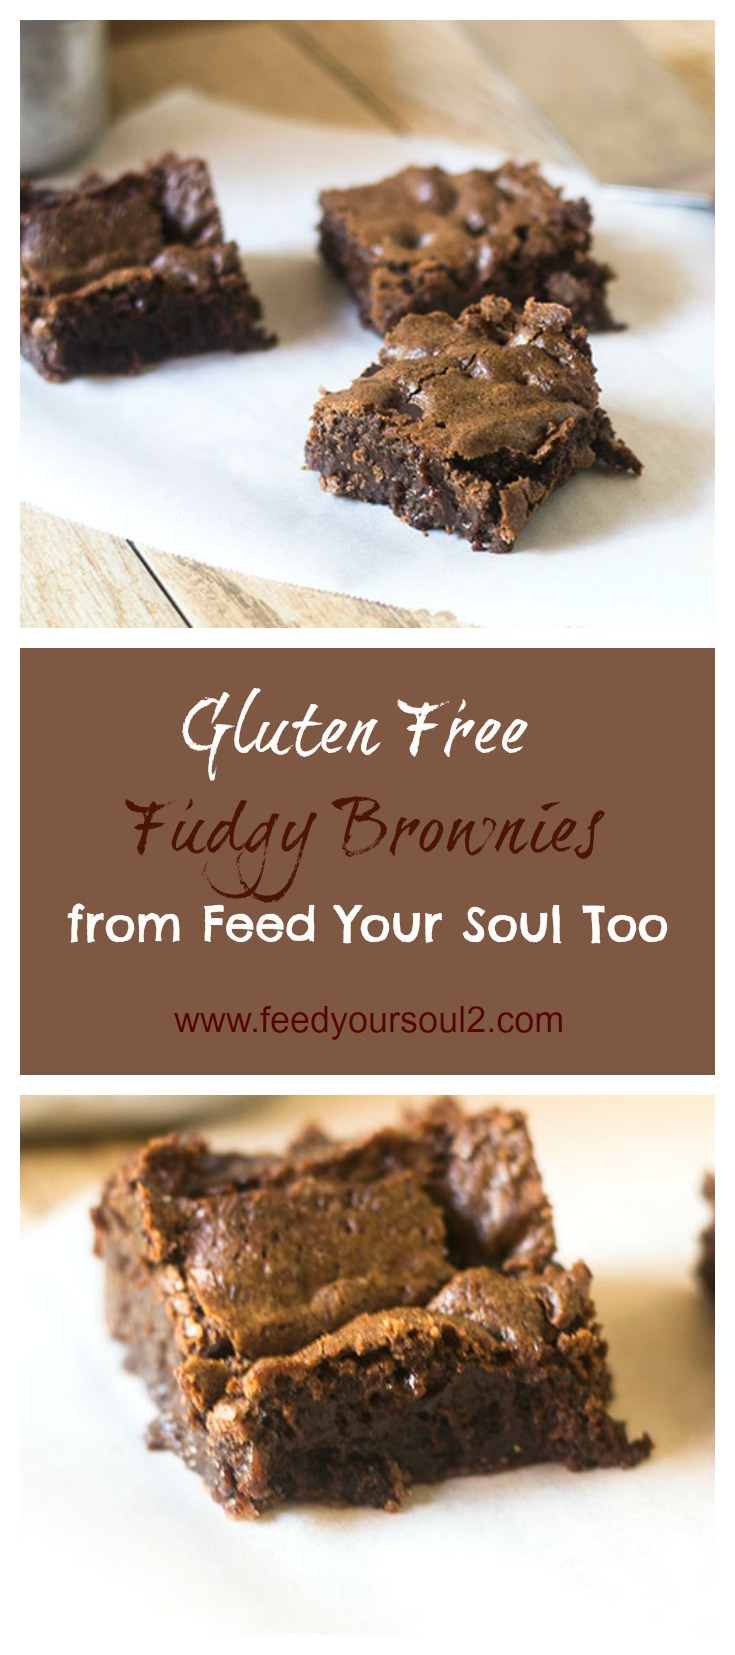 Gluten Free Fudgy Brownies #glutenfree #dessert #chocolate | feedyoursoul2.com